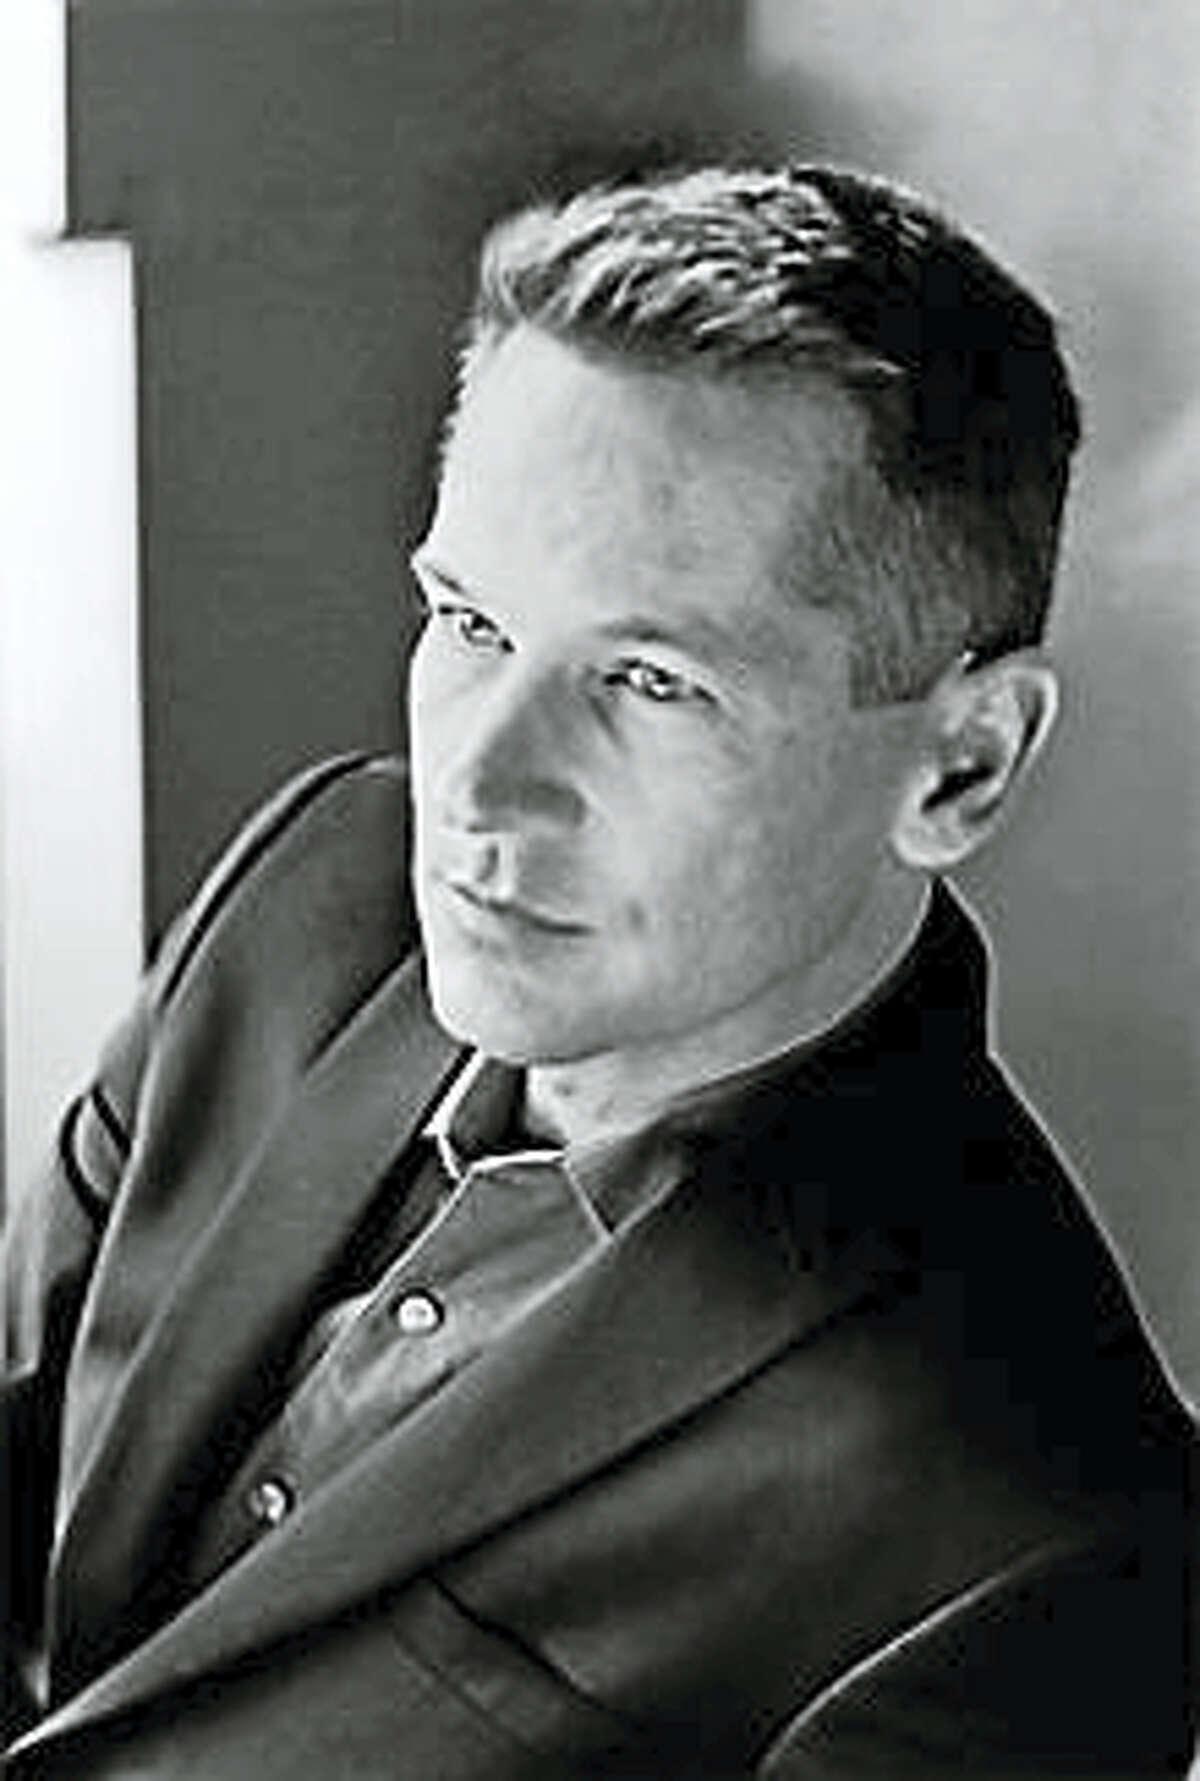 Patrick Phillips teaches at Drew University.